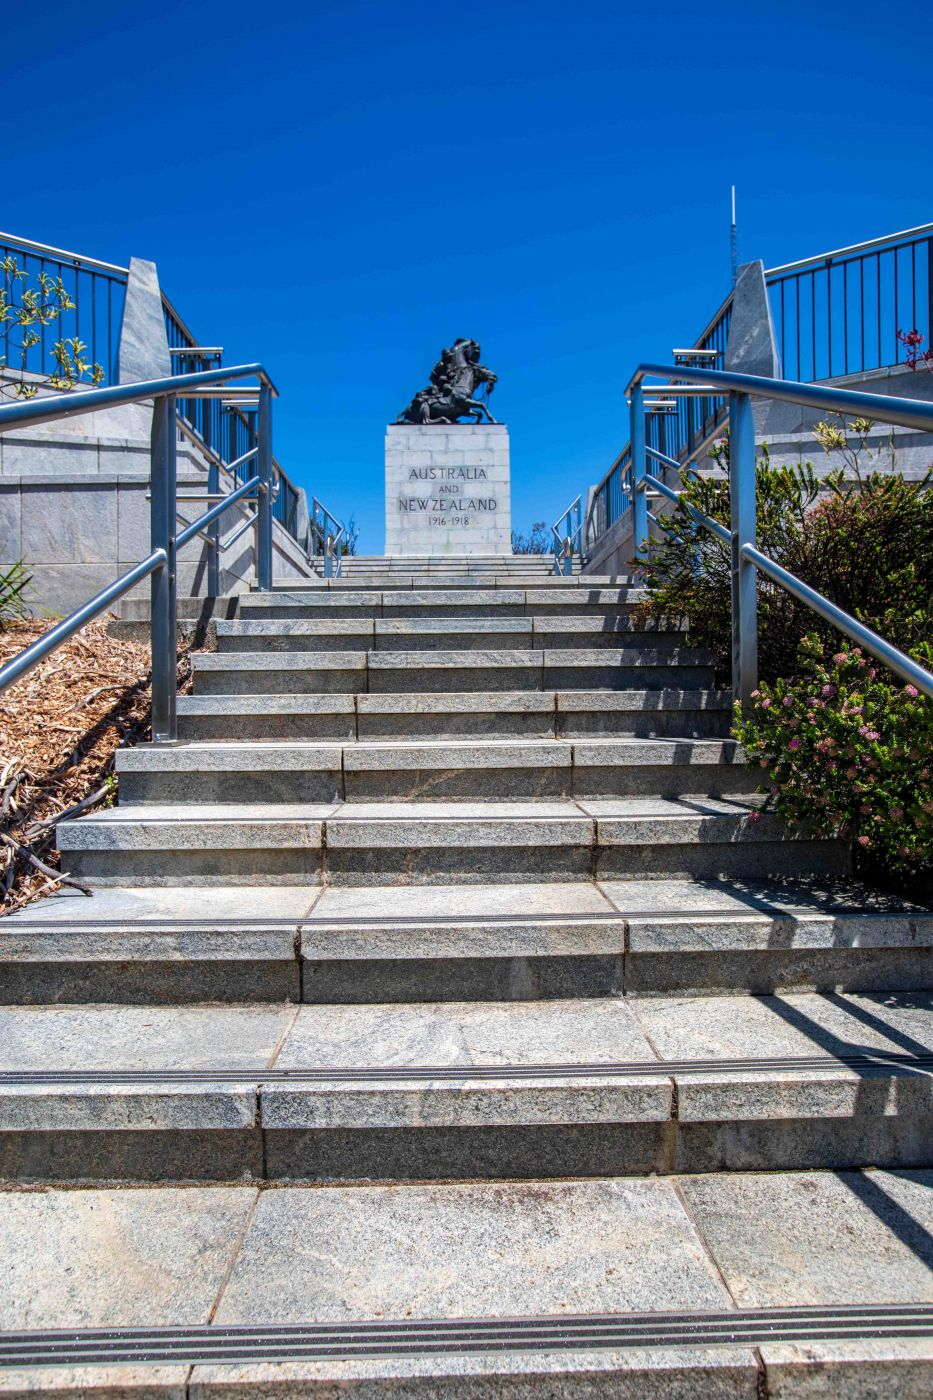 Desert Mounted Corps Memorial, ANZAC memorial Albany, Australia